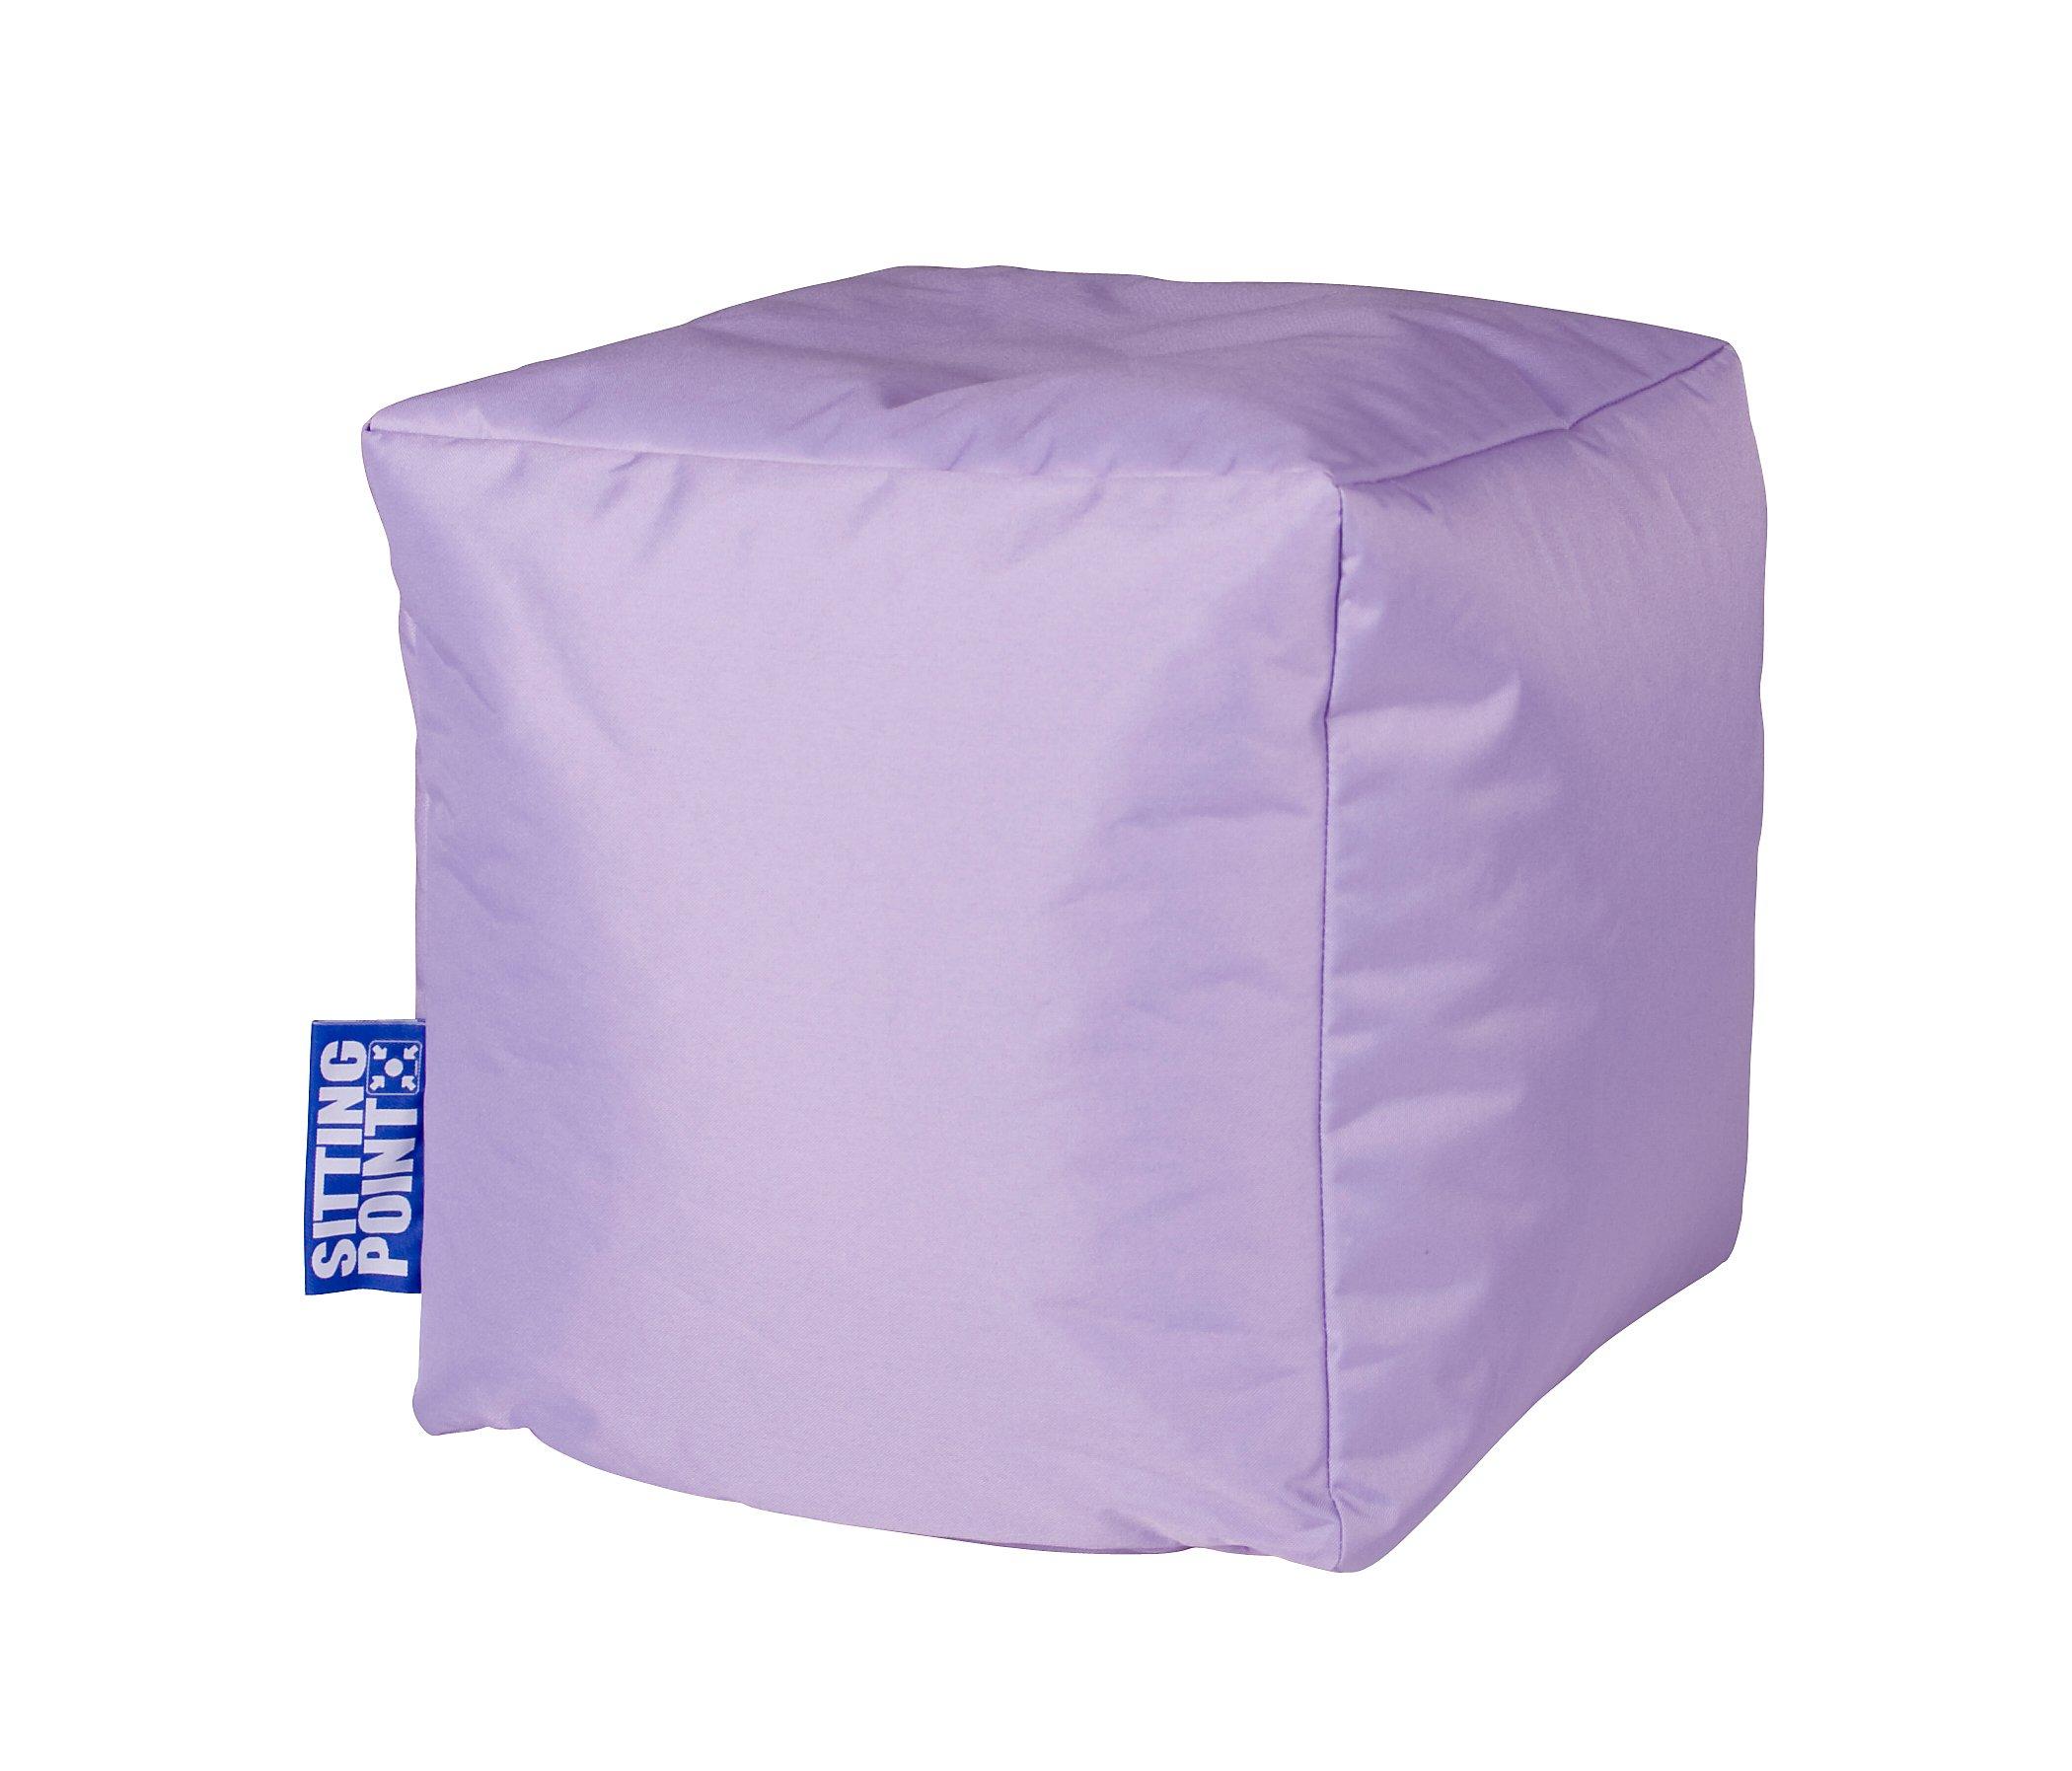 Sitzwurfel Cube Scuba Farbe Flieder Bestellen Weltbild At